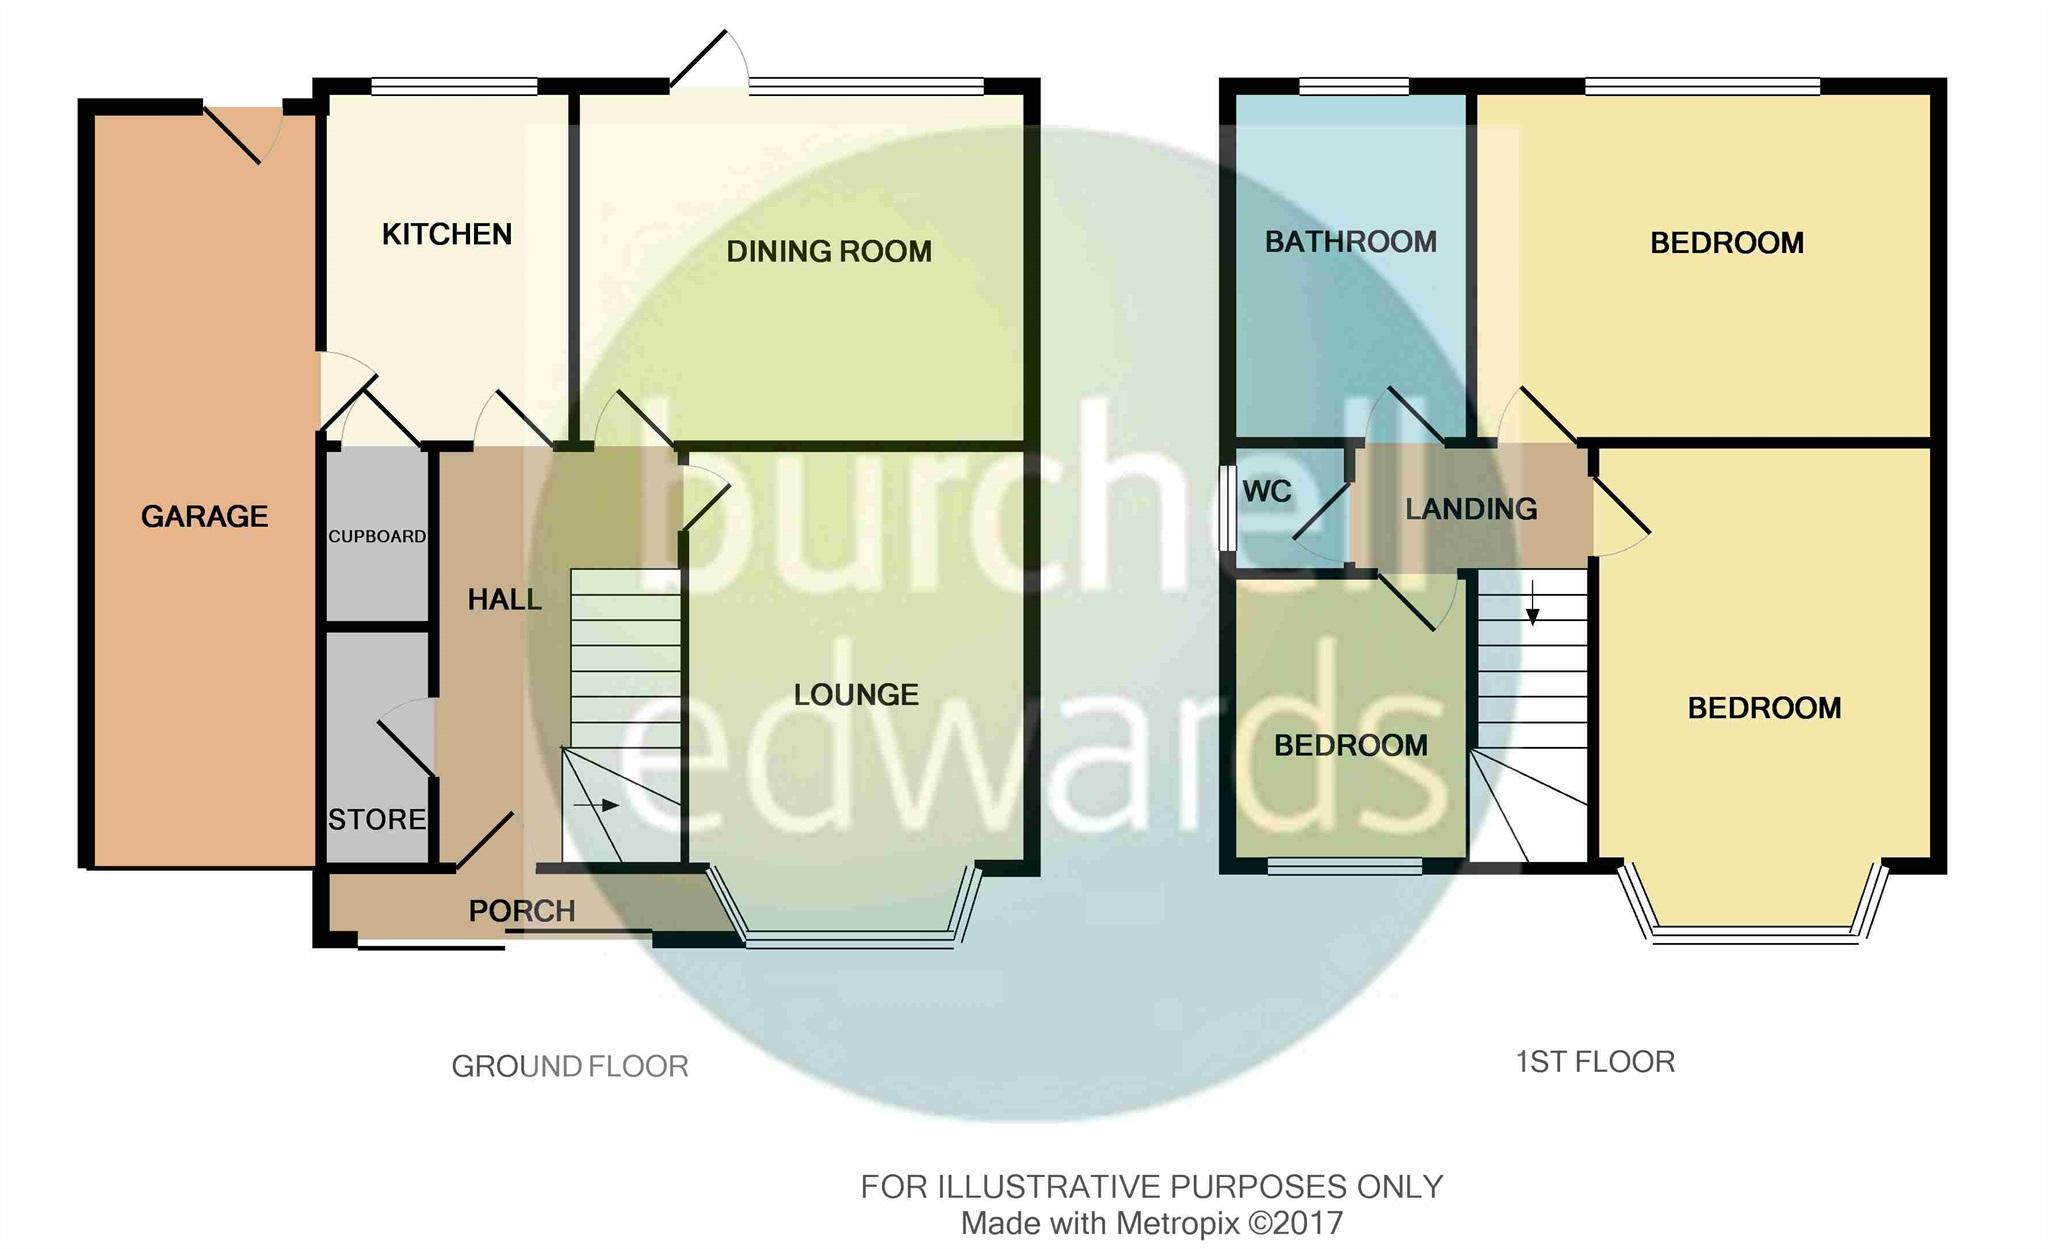 greystoke avenue hodge hill birmingham b36 3 bedroom. Black Bedroom Furniture Sets. Home Design Ideas